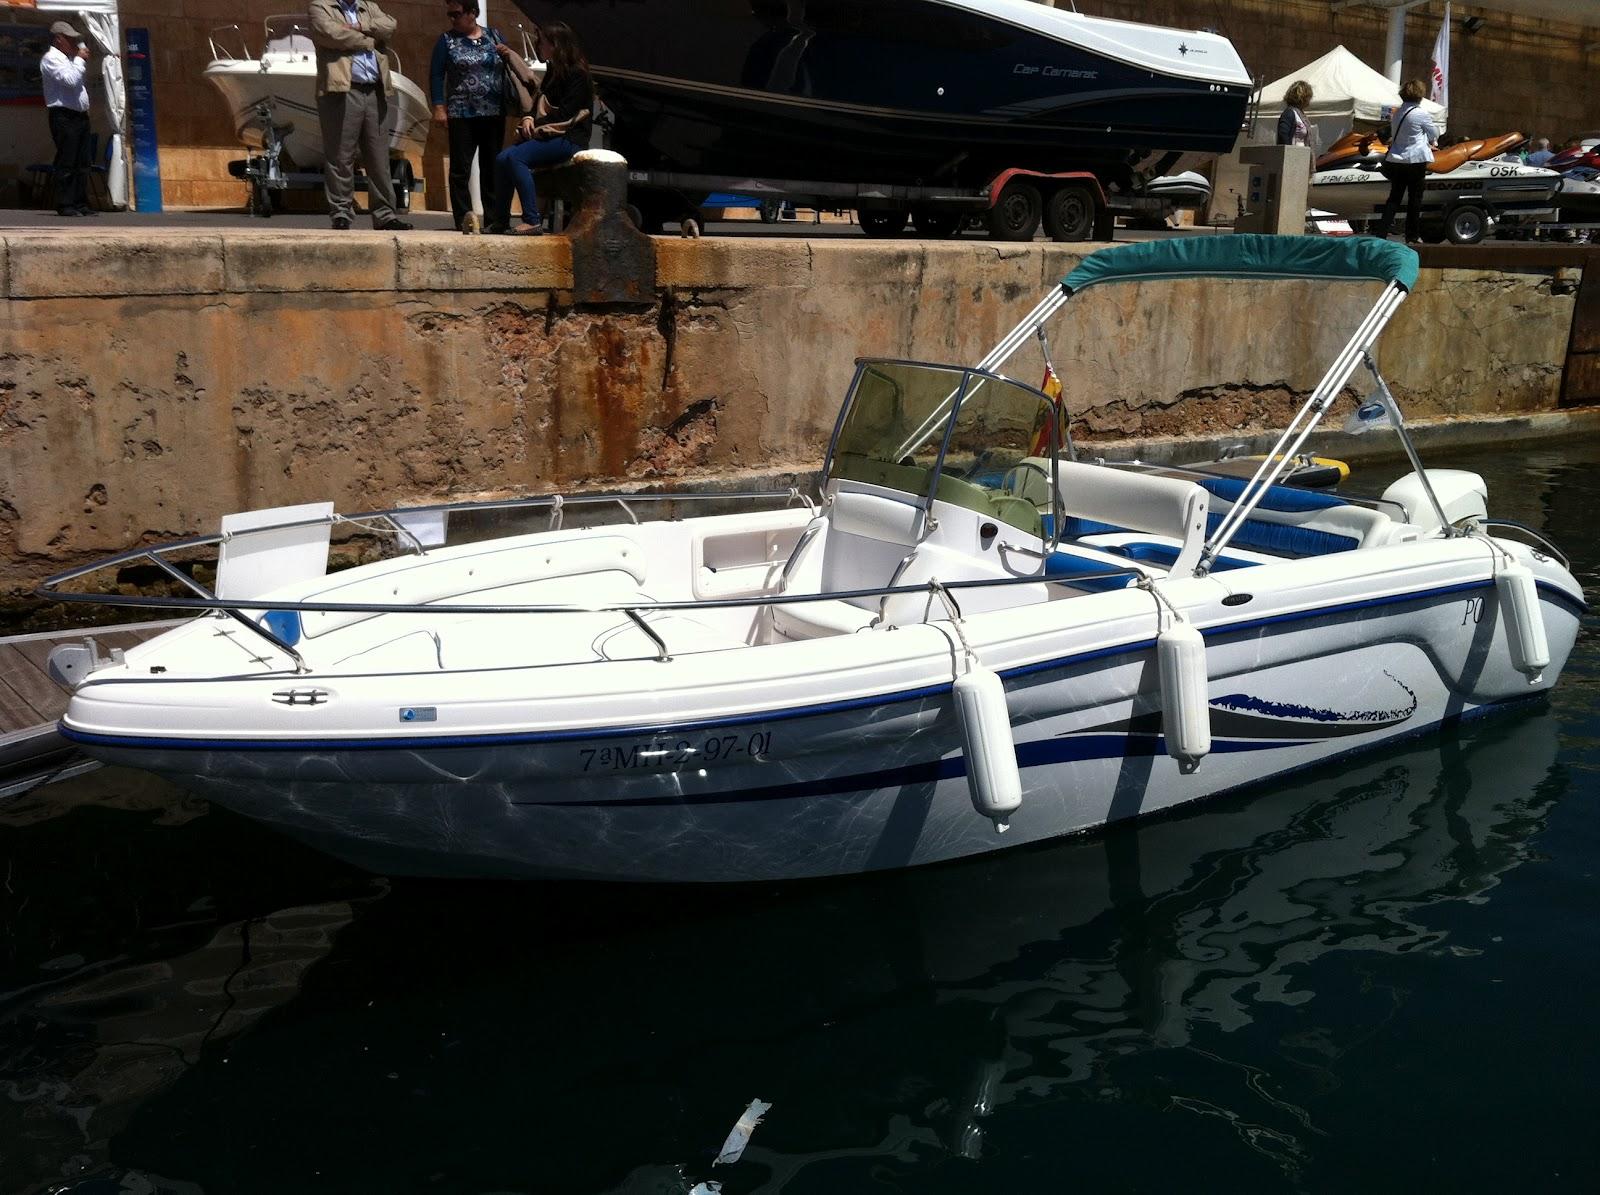 Web barcos ocasi n en menorca actualizada centre n utic for Todo sobre barcos